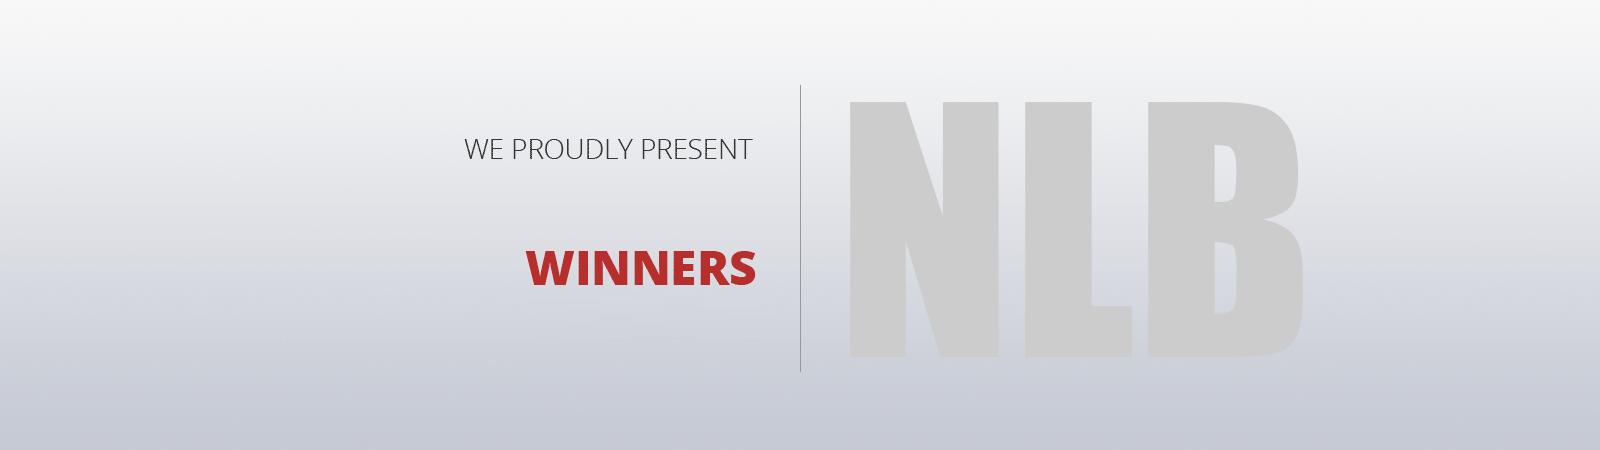 Winners Directory | National Lotteries Board, Sri Lanka